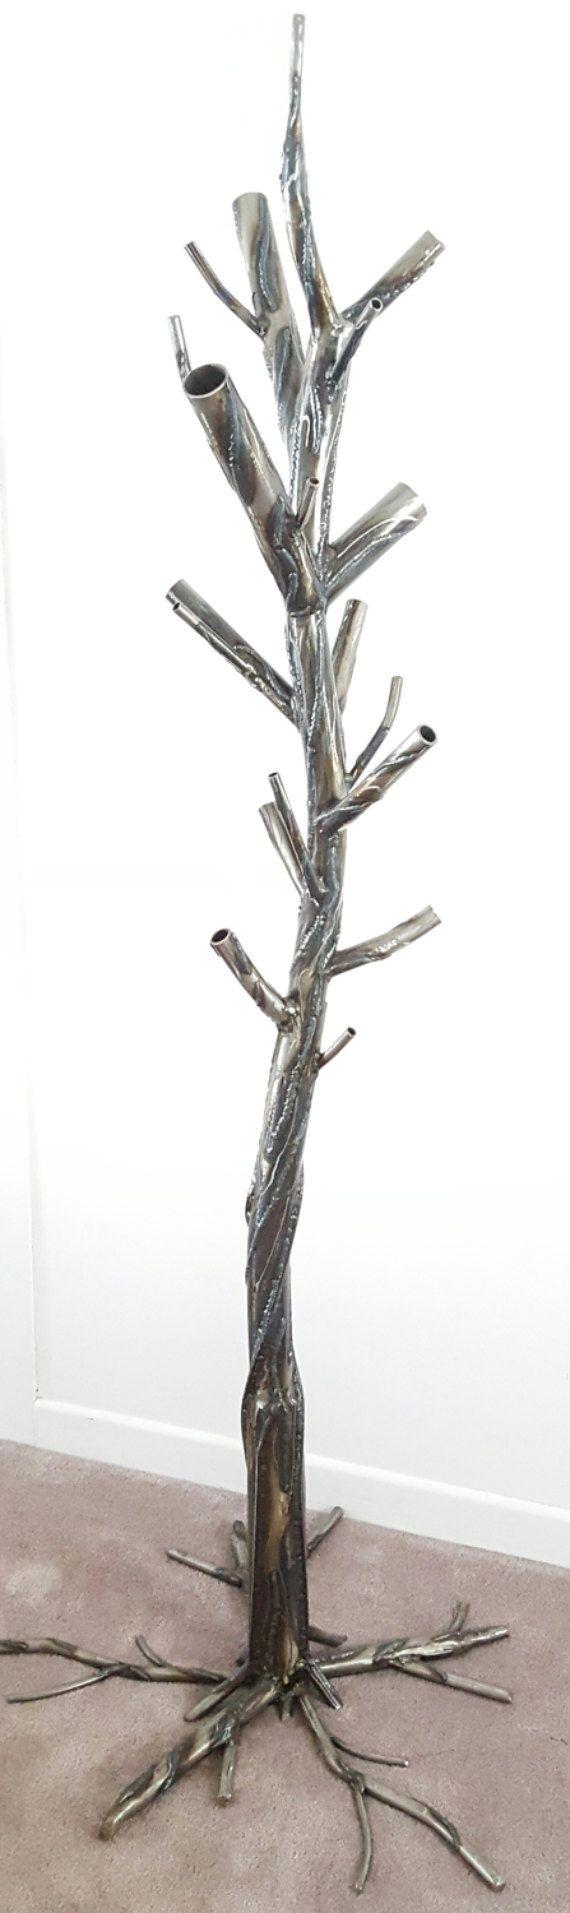 25+ best ideas about Tree Coat Rack on Pinterest